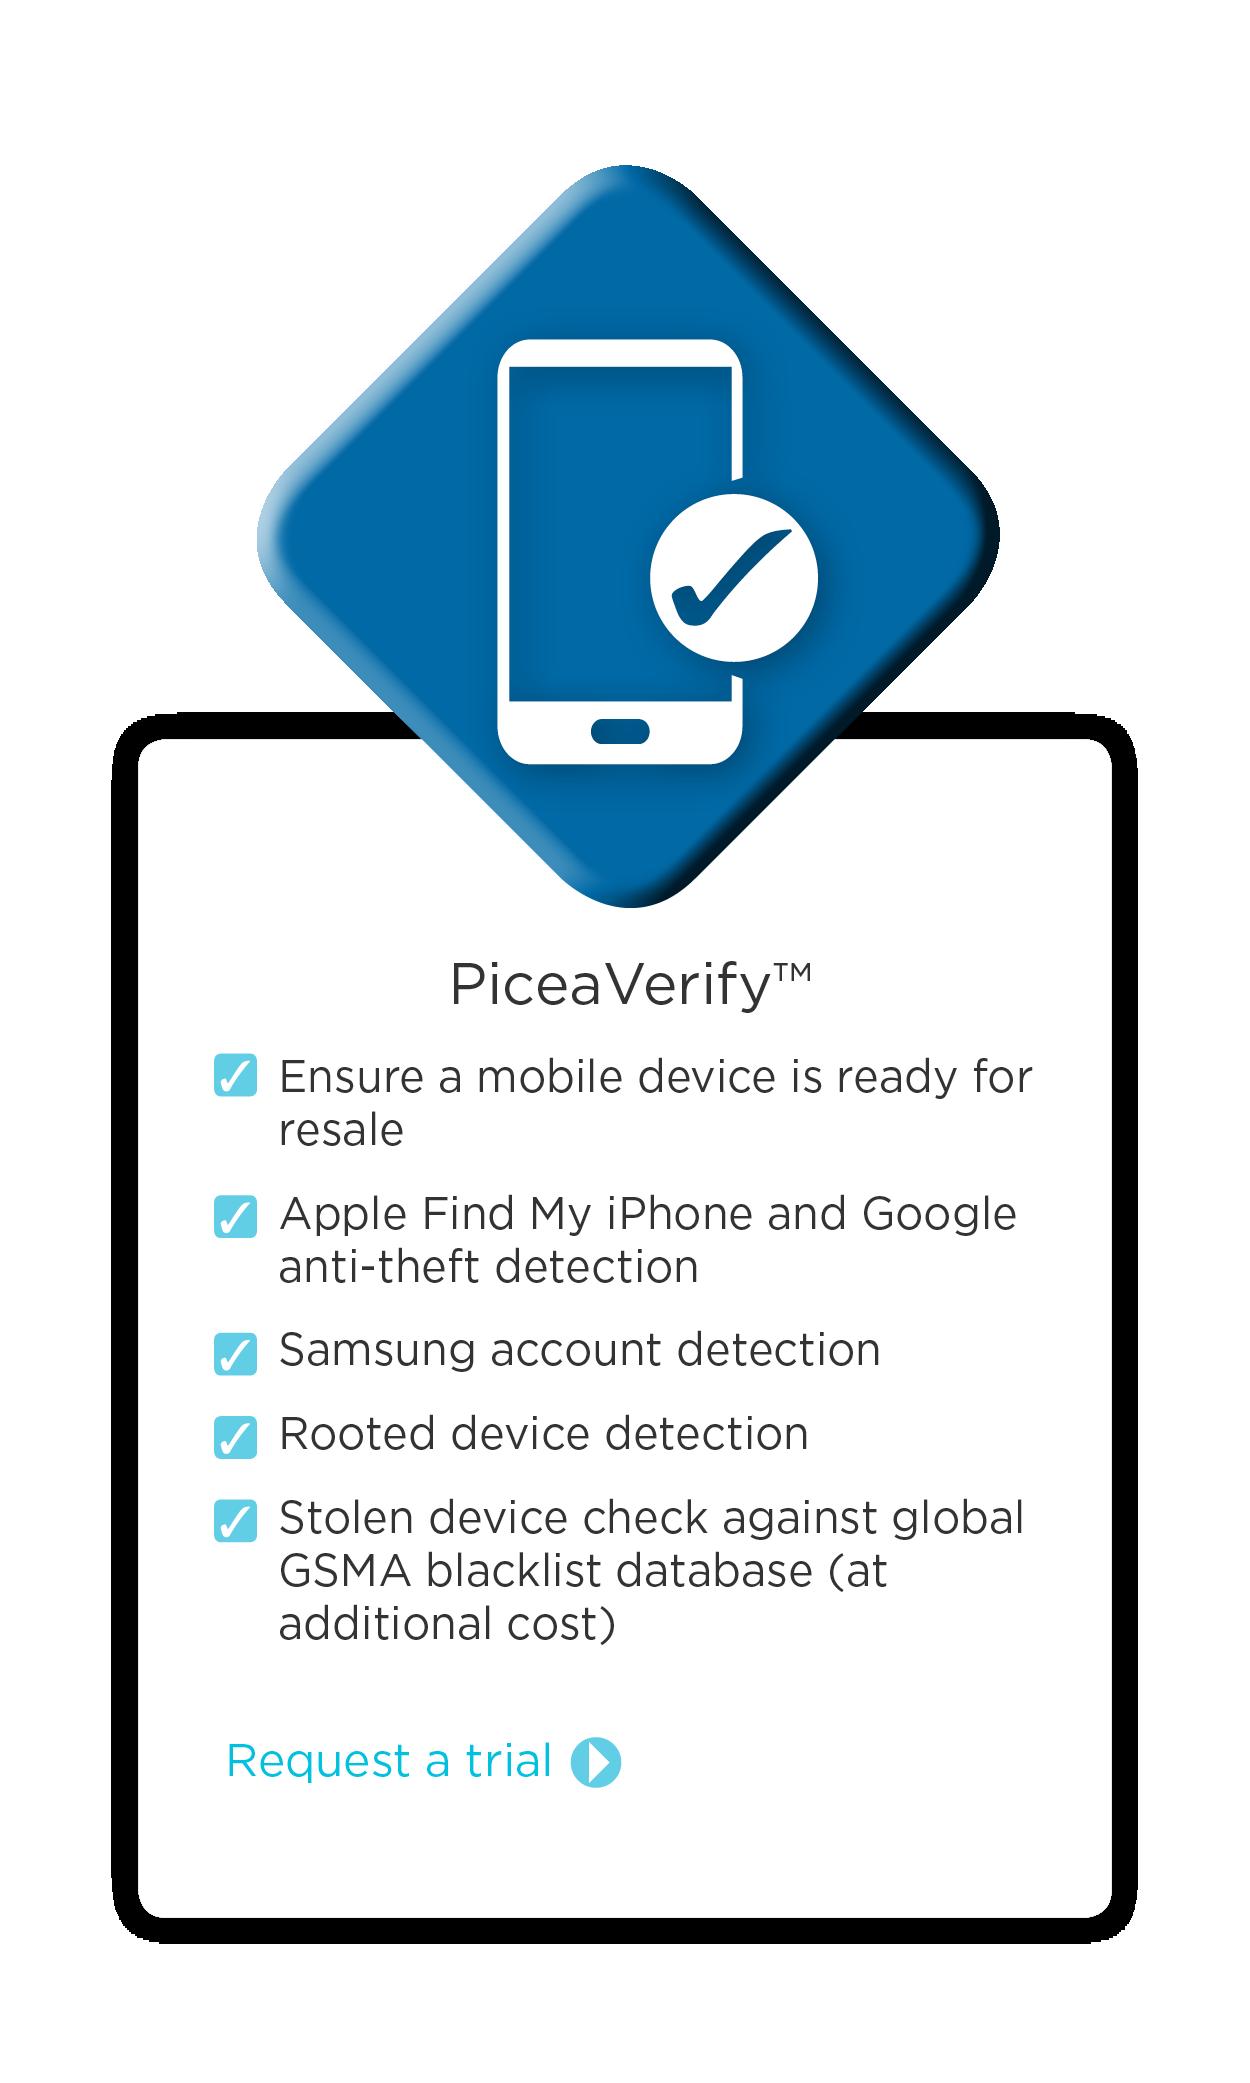 PiceaVerify